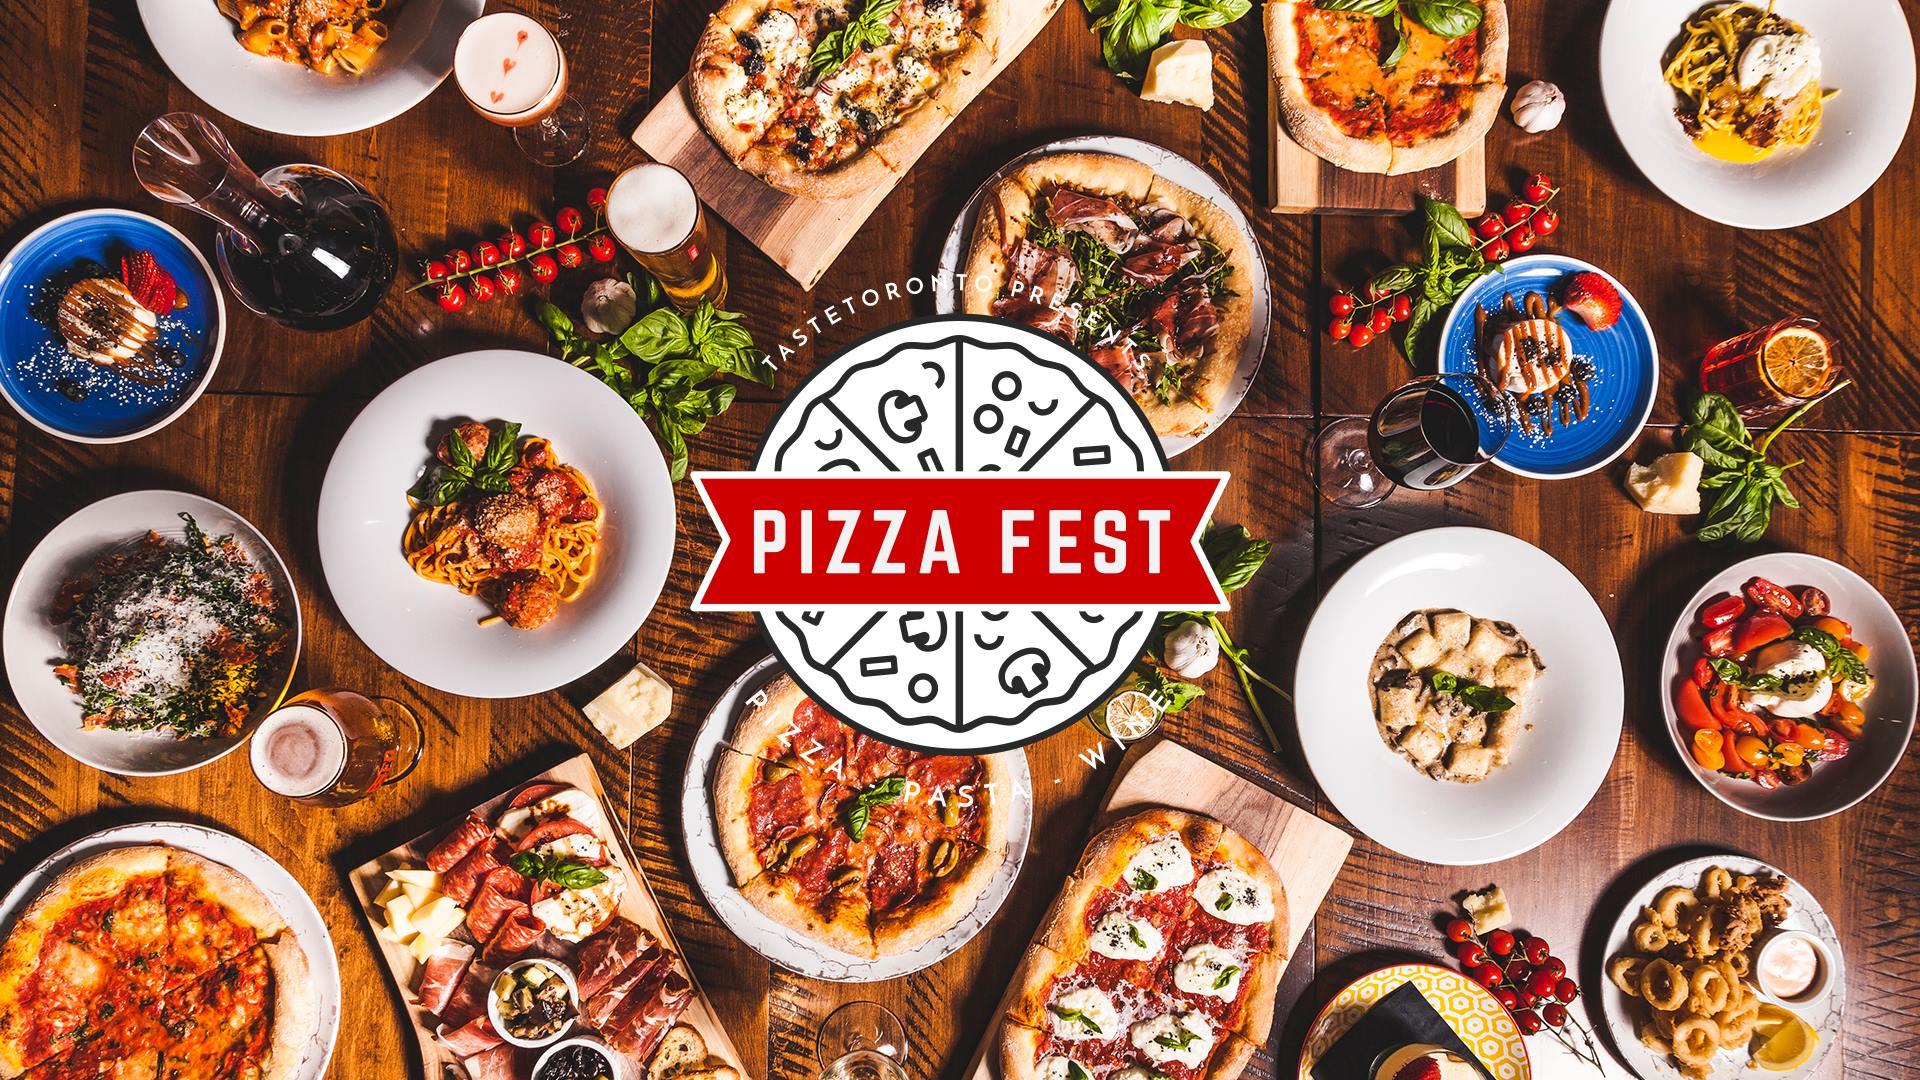 Toronto Pizza Fest